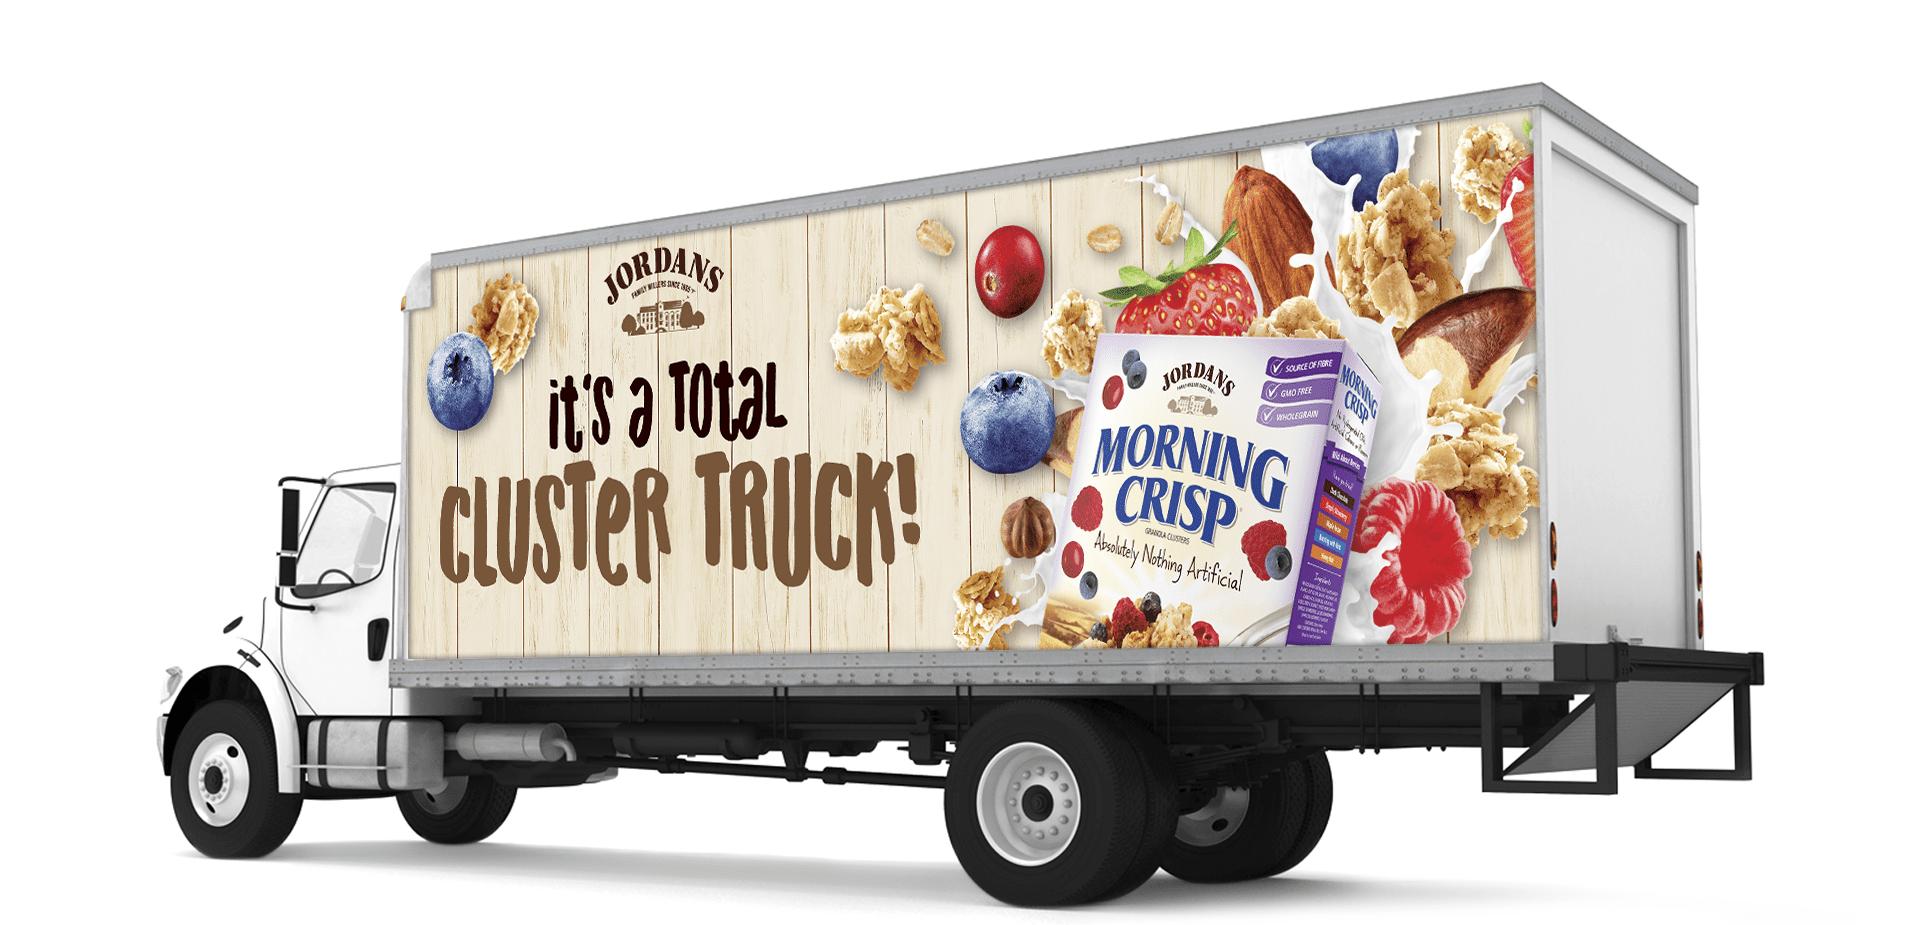 Jordans Morning Crisp transport truck decal